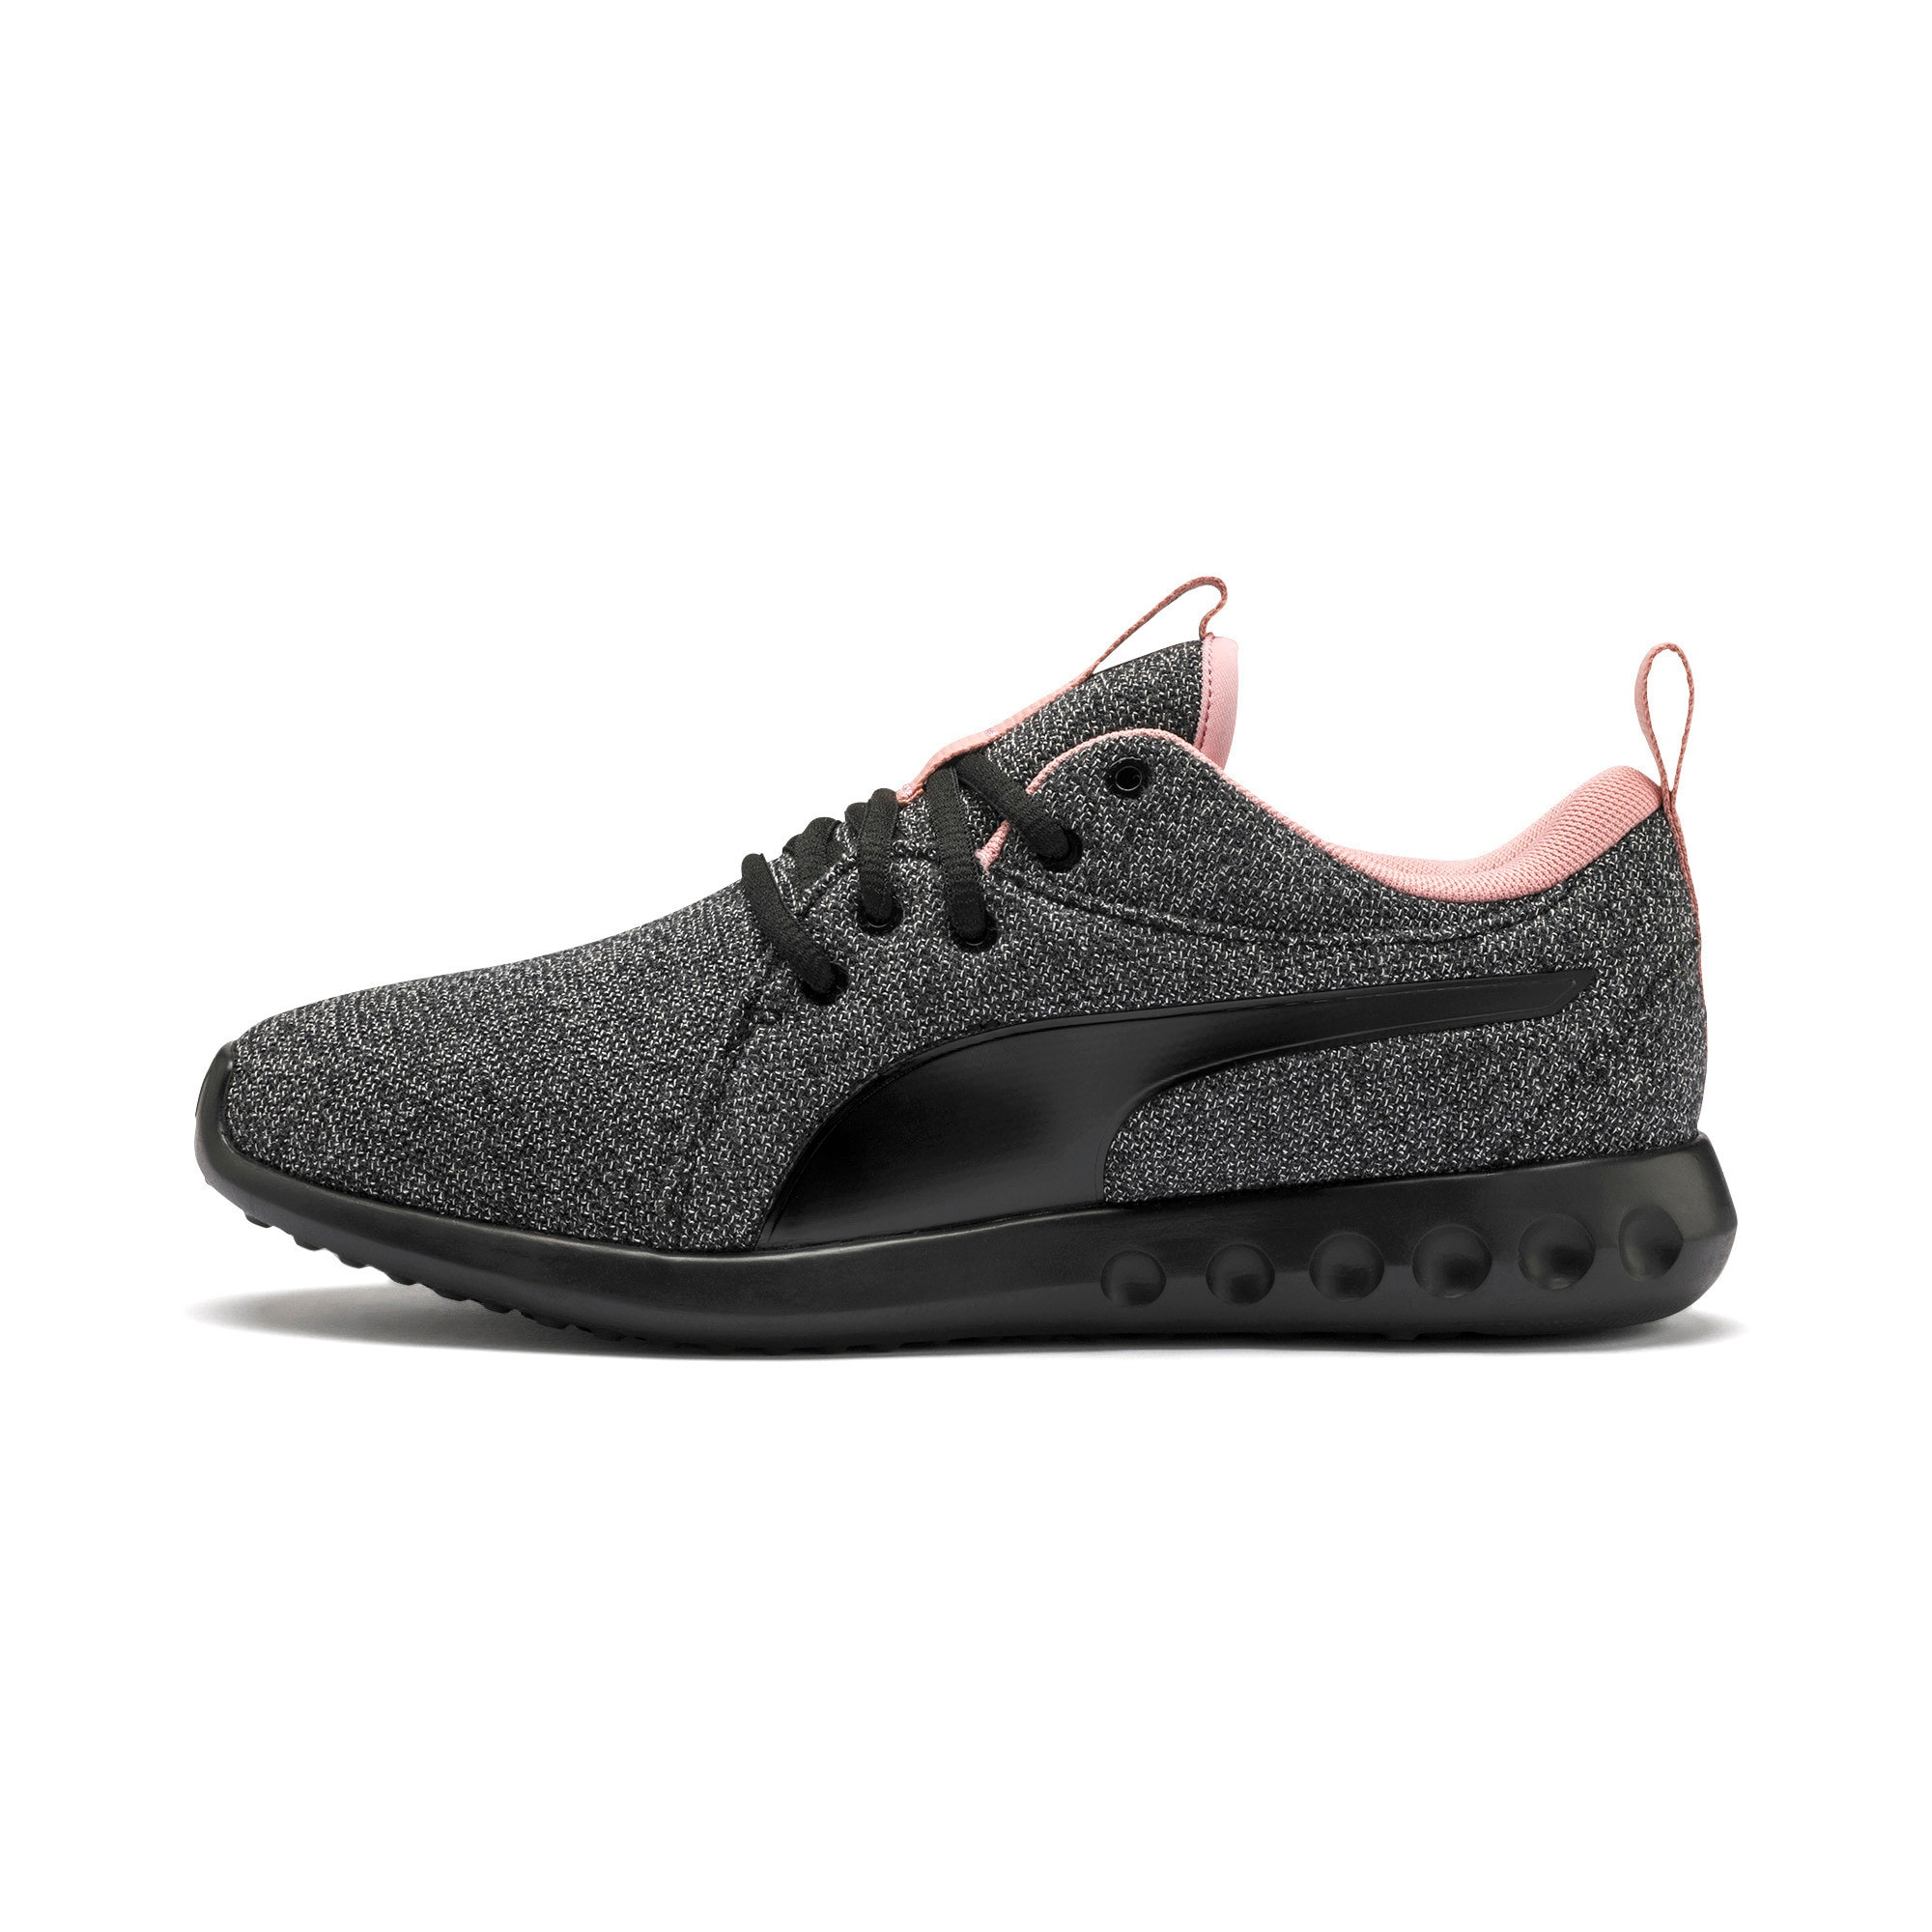 Thumbnail 1 of Carson 2 Knit Women's Running Shoes, Puma Black-White-Bridal Rose, medium